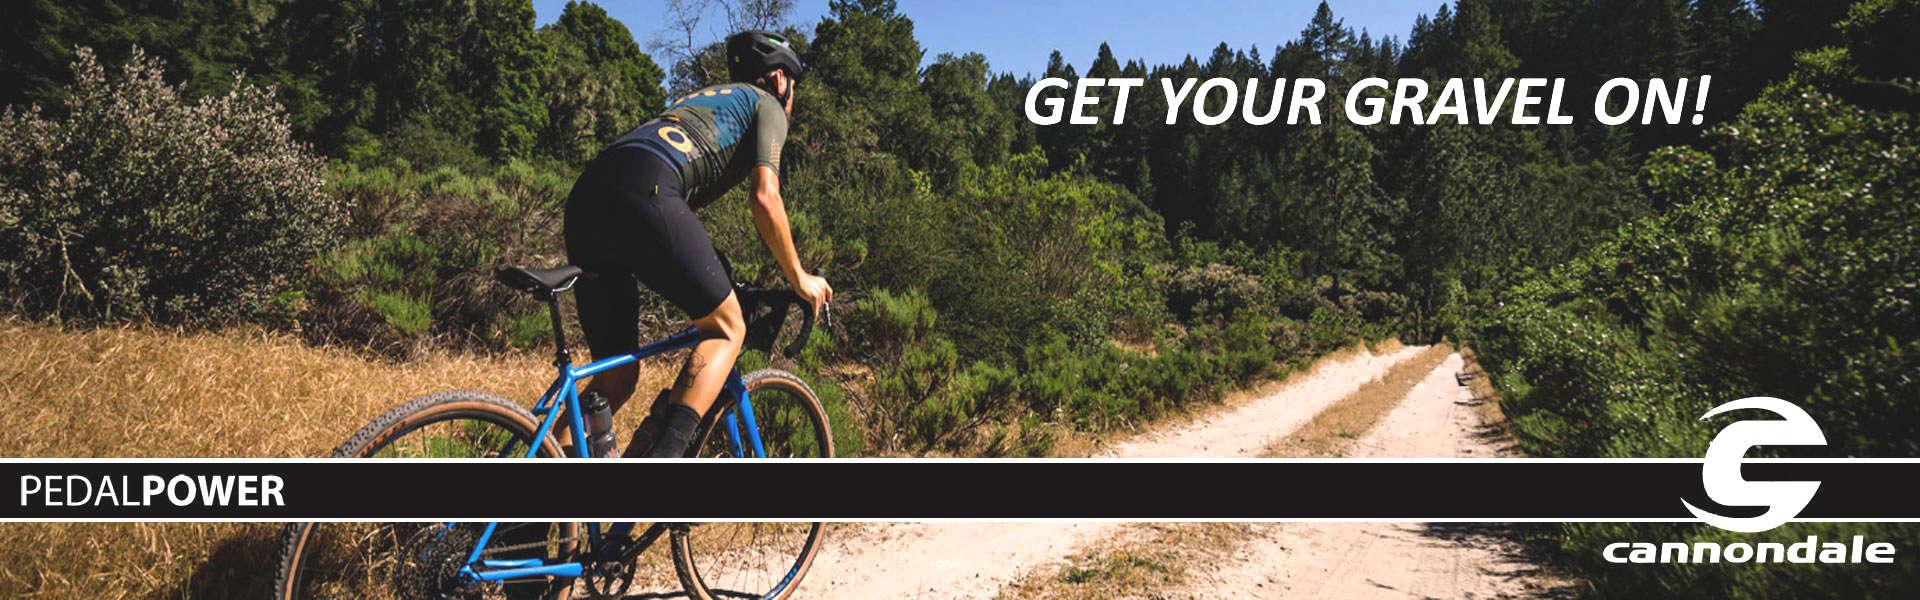 PedalPower Gravel Bikes